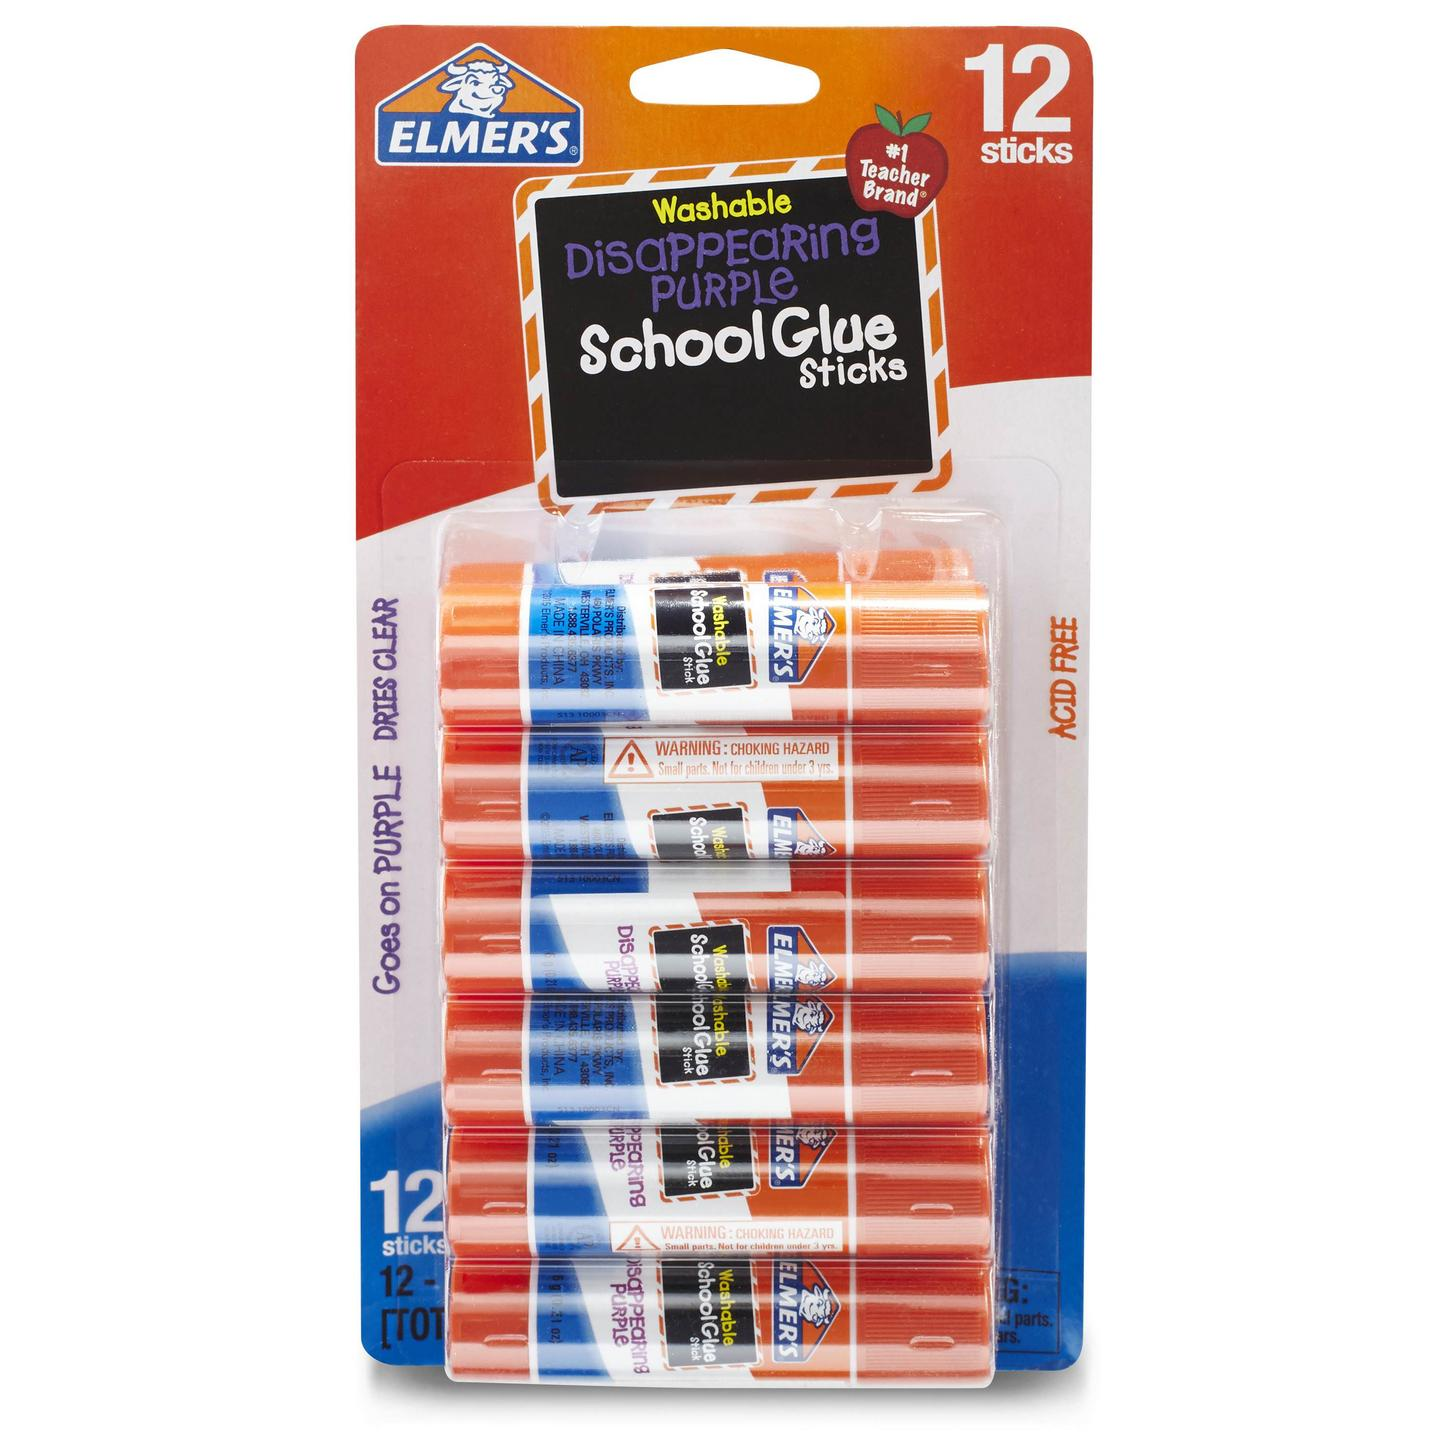 Elmer's Disappearing Purple Washable School Glue Sticks, 0.21 Ounces, 12 Count